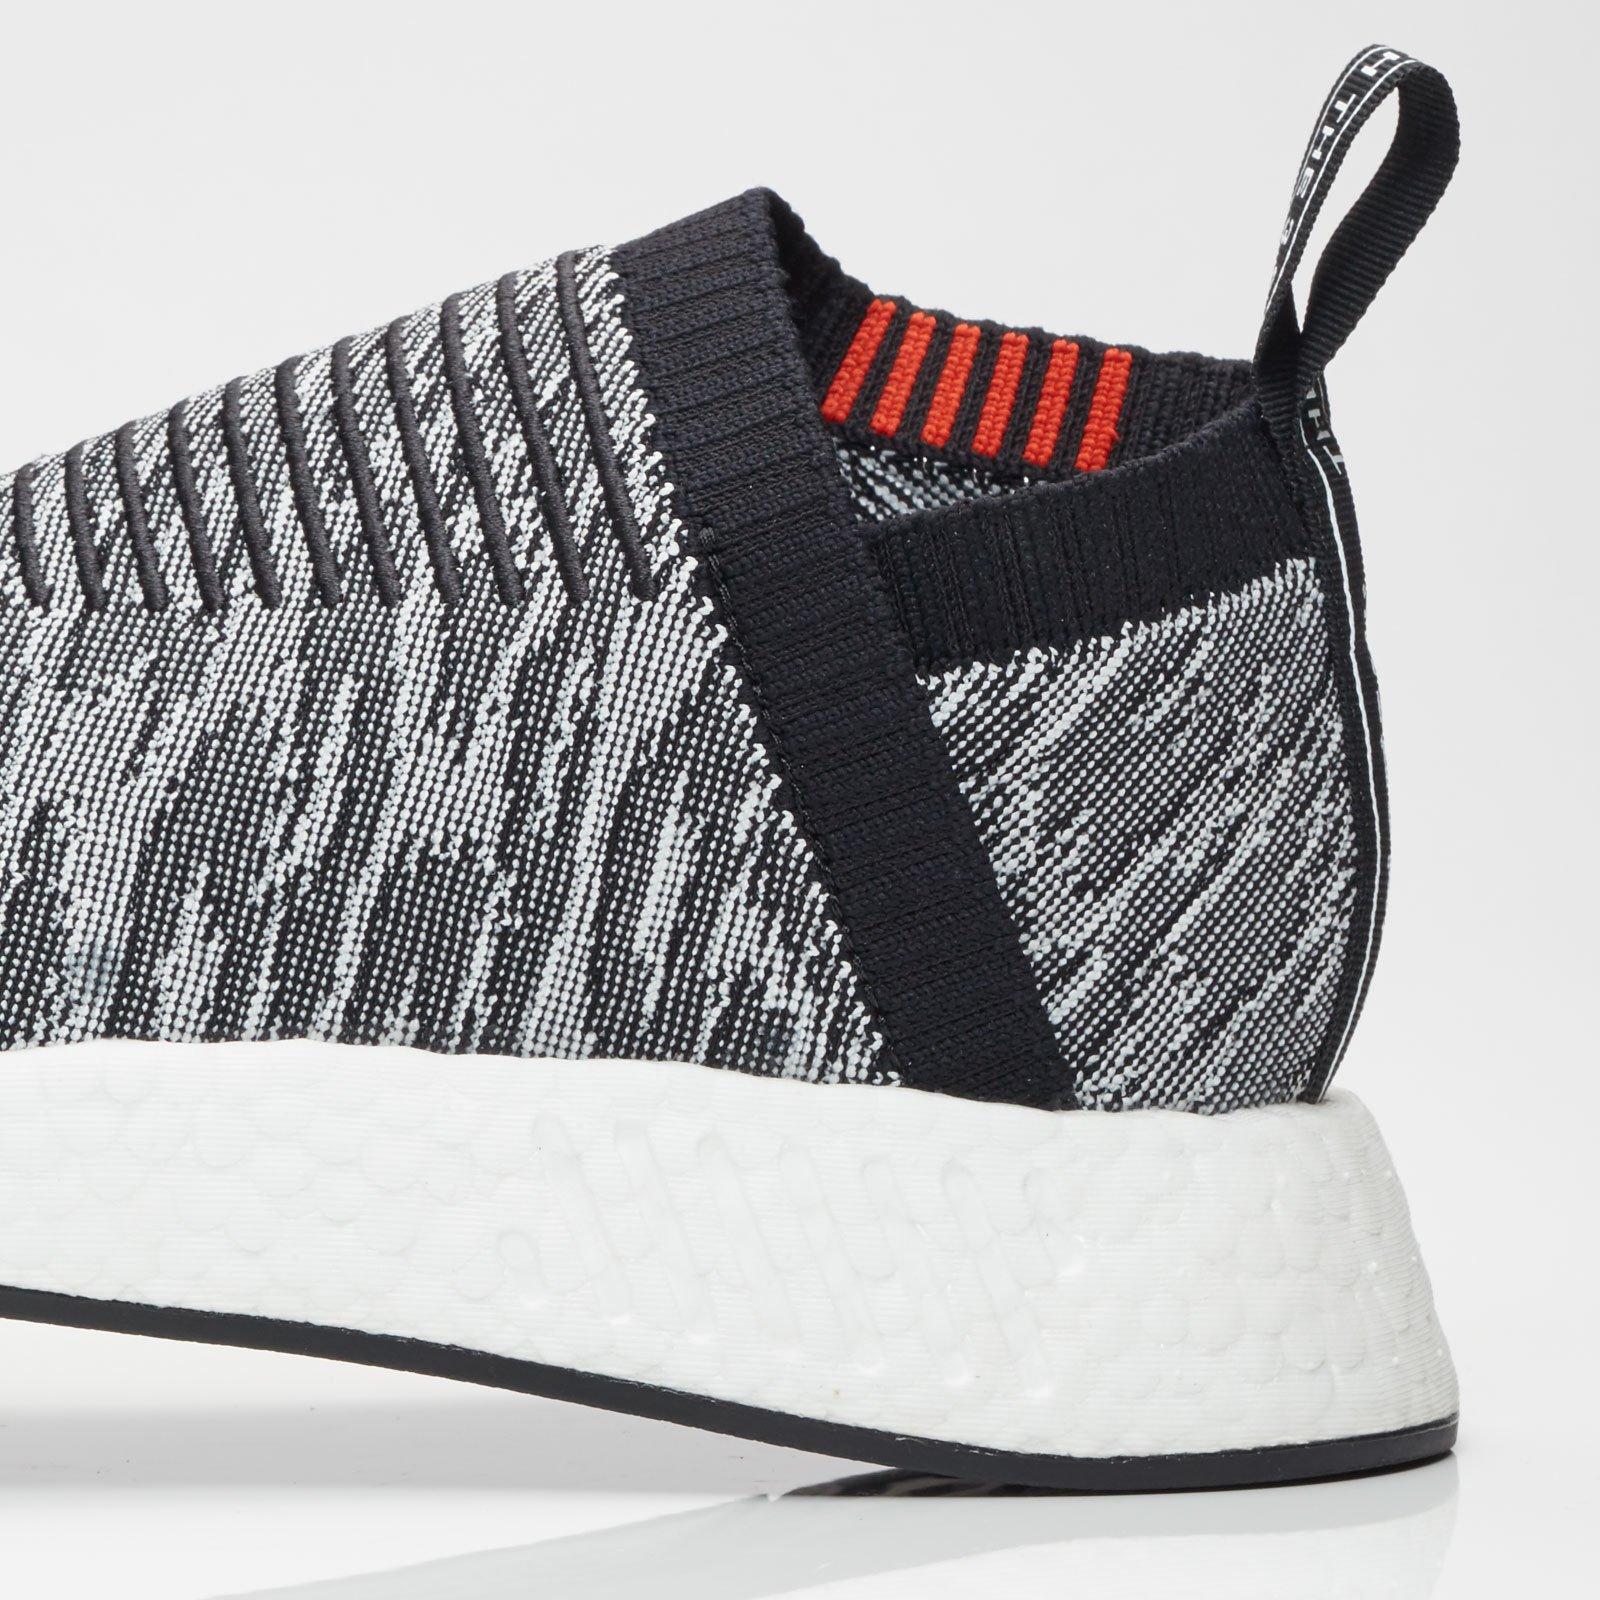 adidas originals nmd_cs2 primeknit boost sneaker bz0515